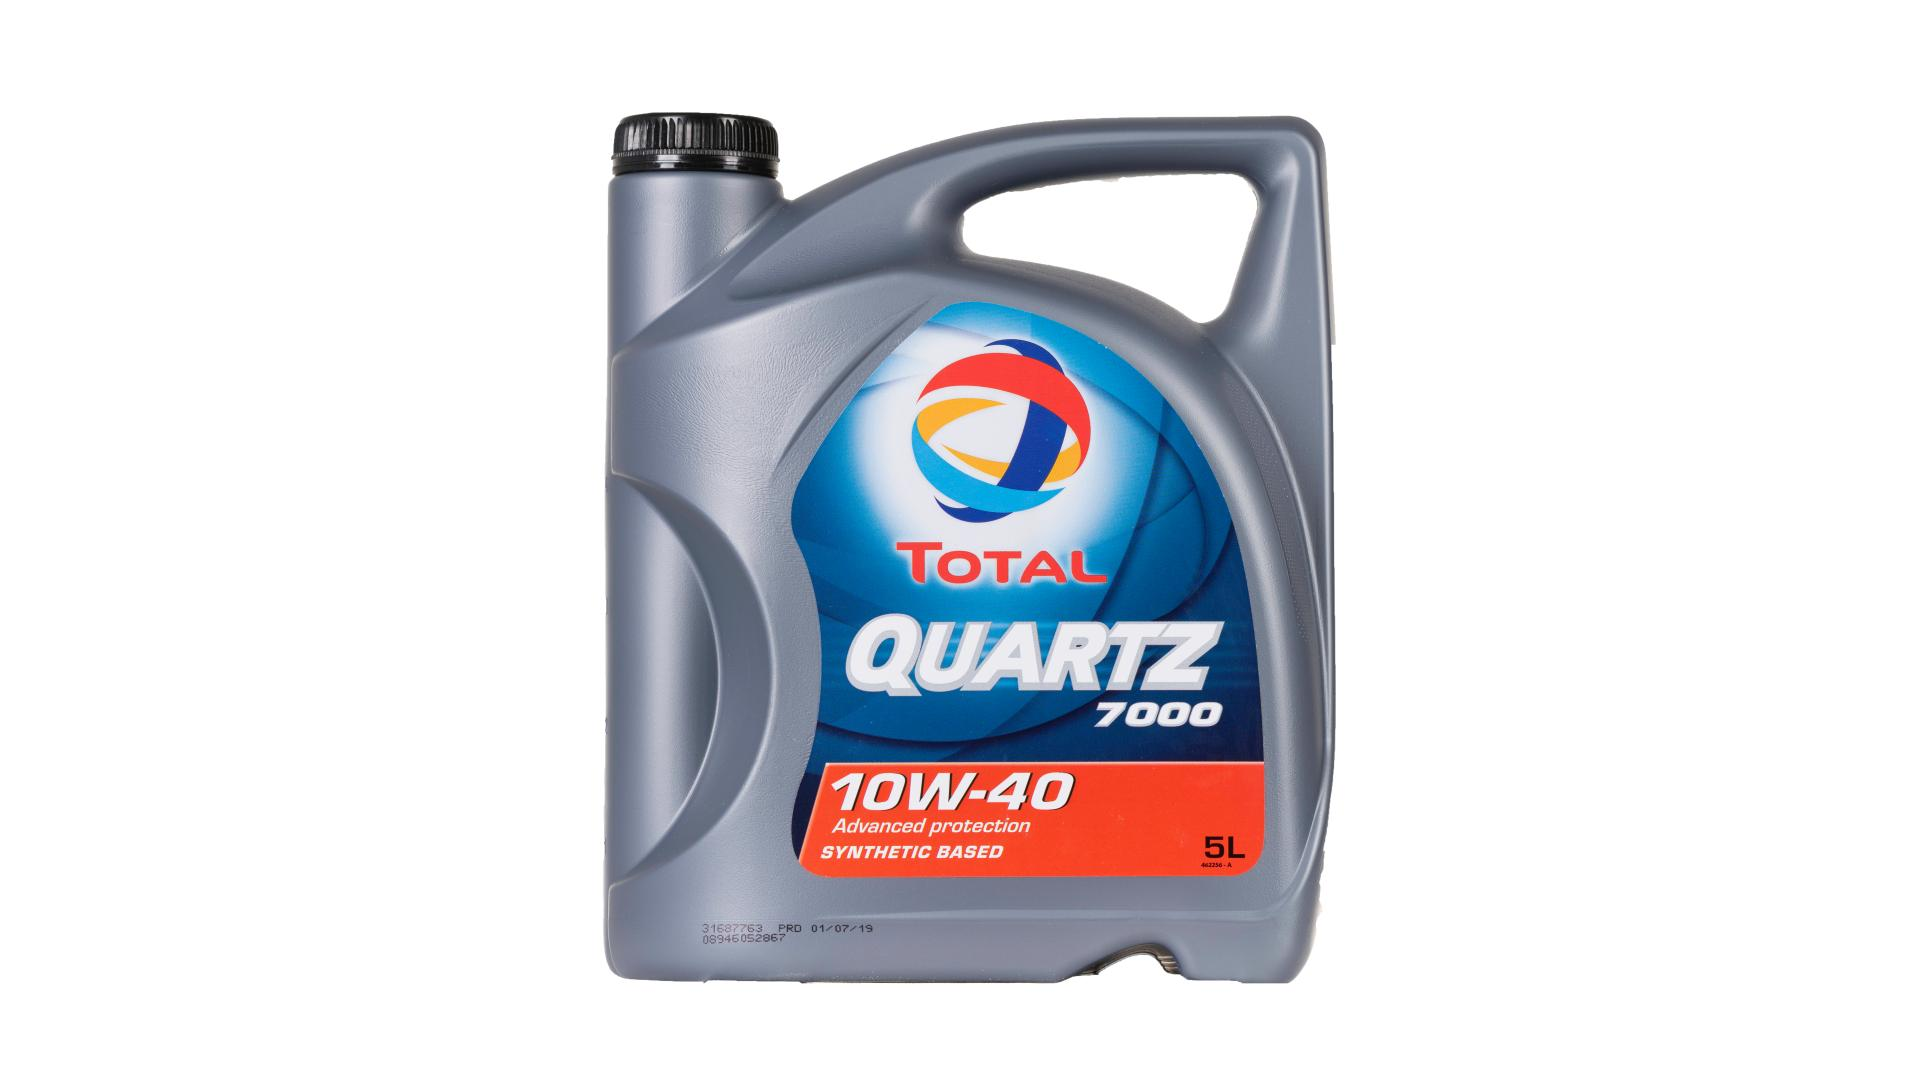 Total 10w-40 Quartz 7000 5L (201525) (203703)